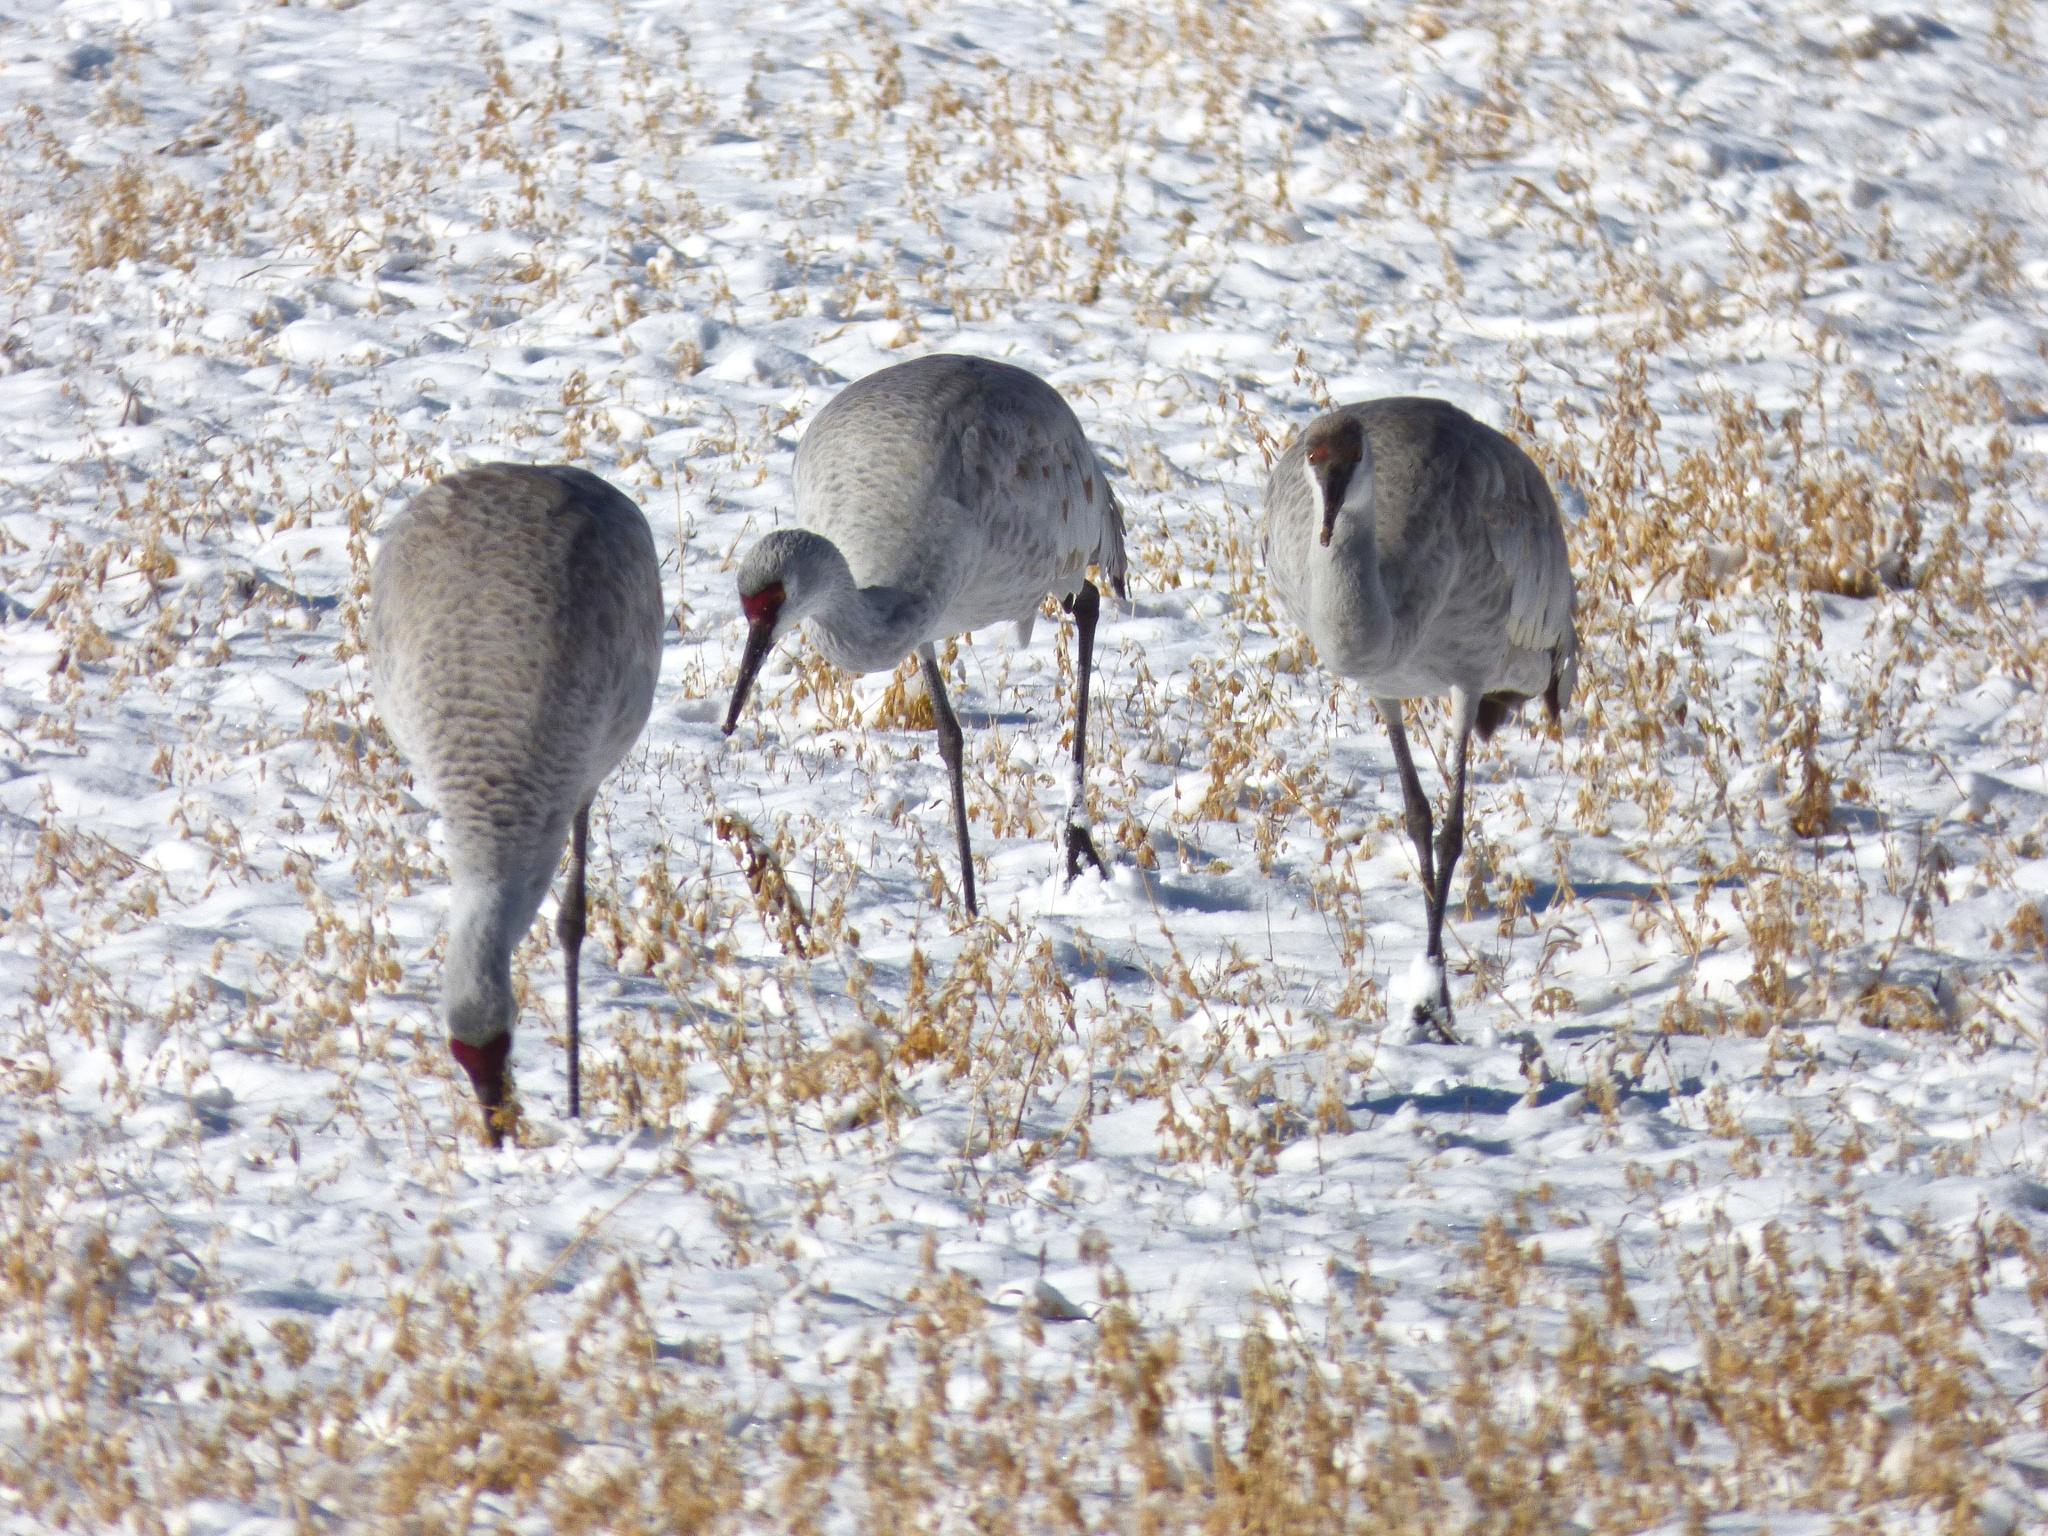 Sandhill Cranes in the snow by Hunter Ten Broeck